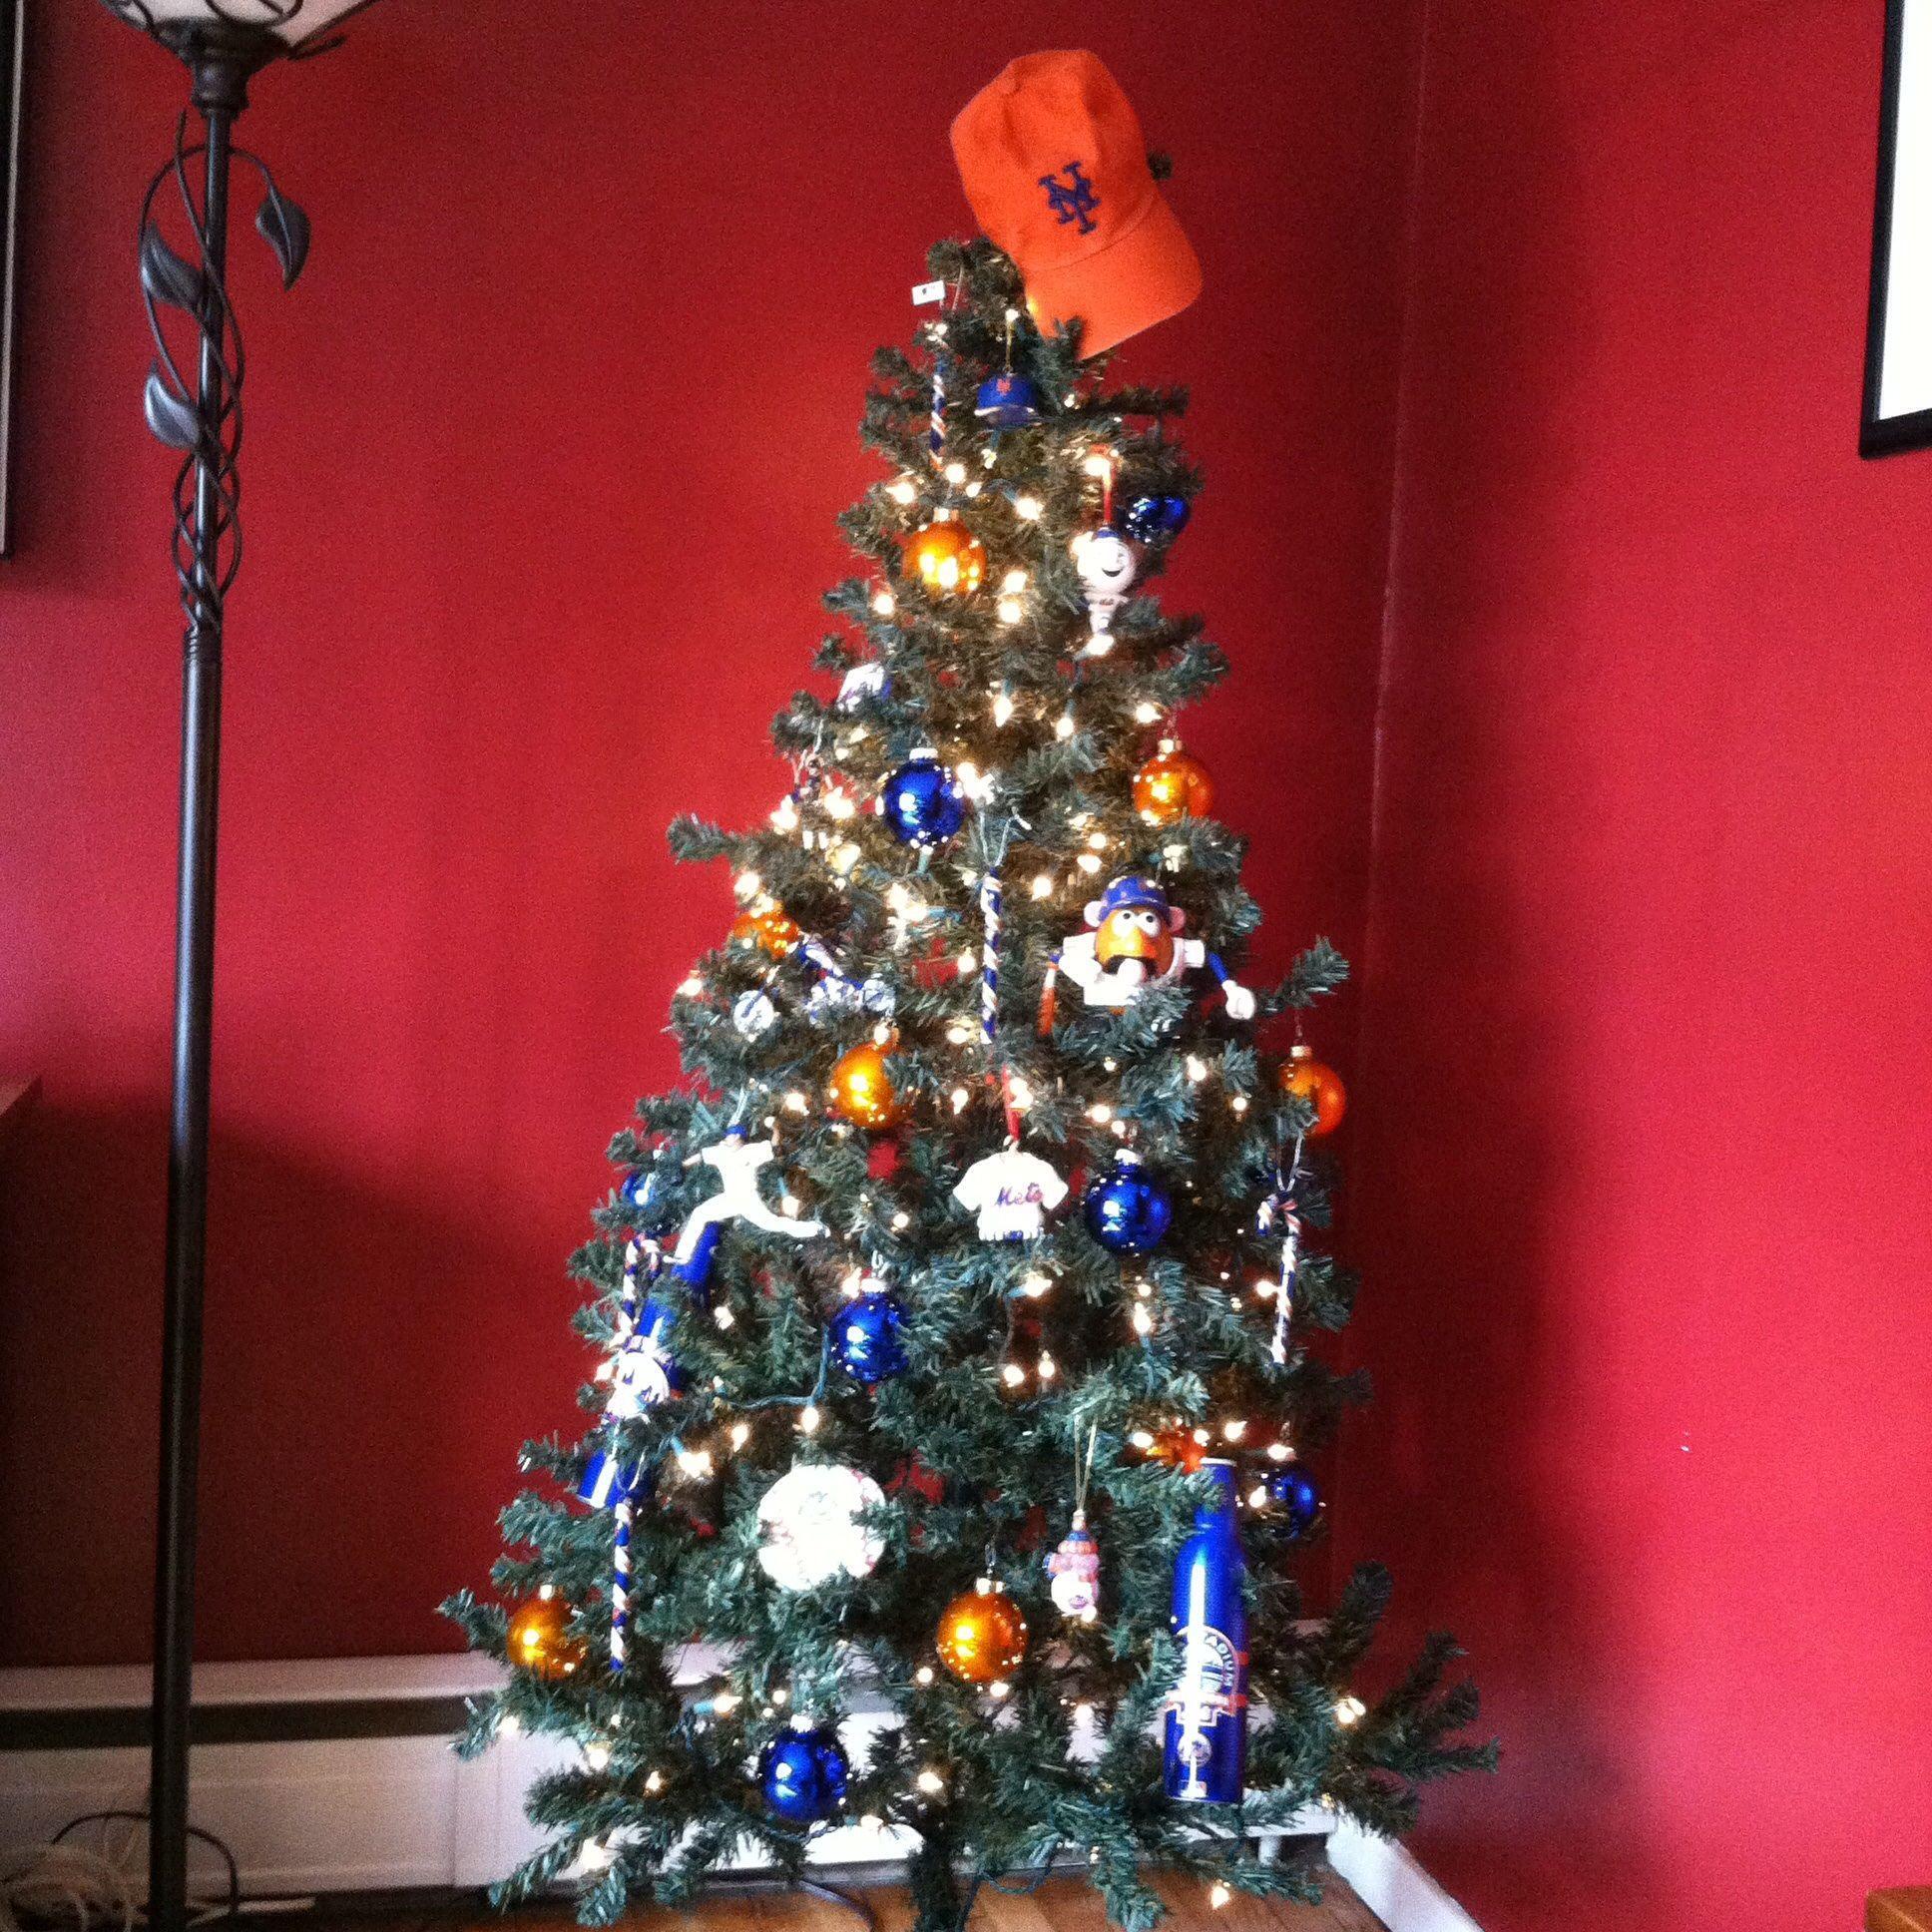 New York Mets Christmas Tree | Baseball | Pinterest | Christmas tree